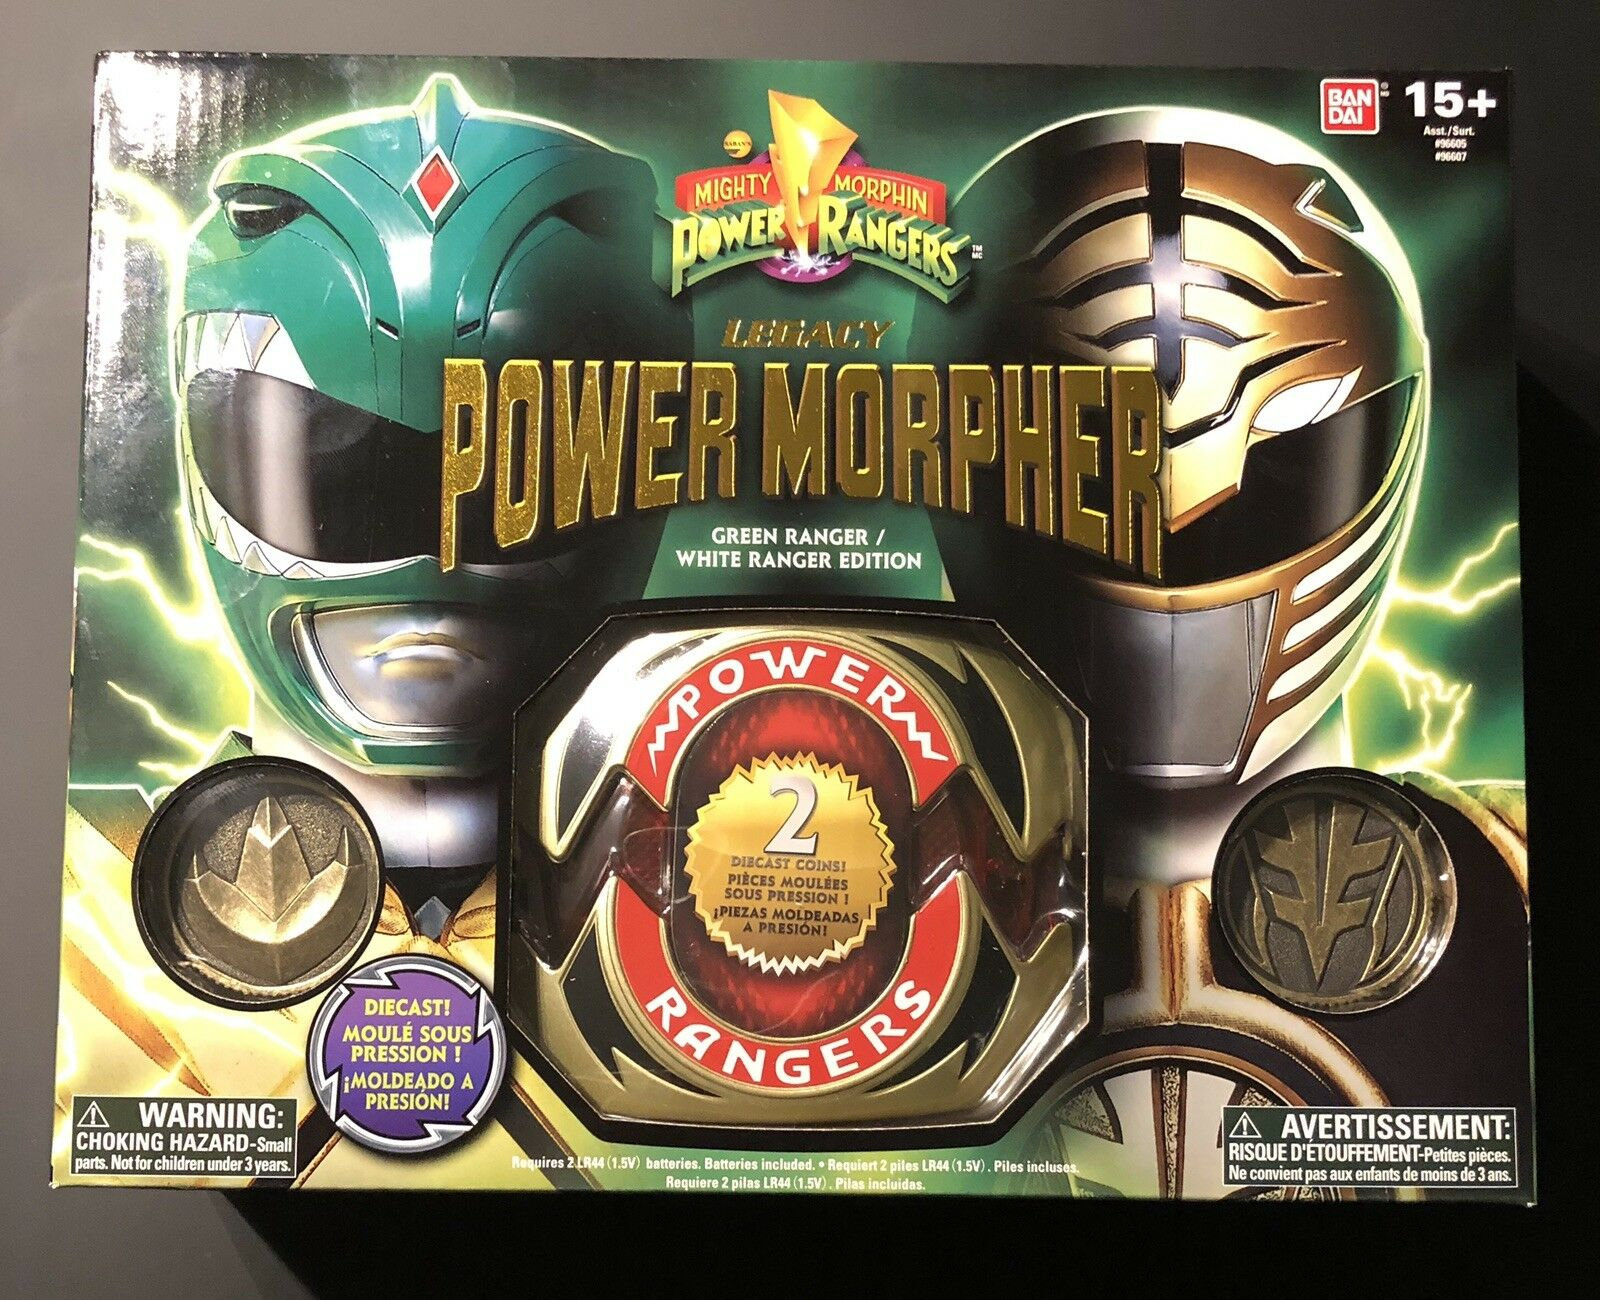 Legacy Mighty Morphing Power Ranger Grün Ranger Weiß Ranger Morpher Diecast